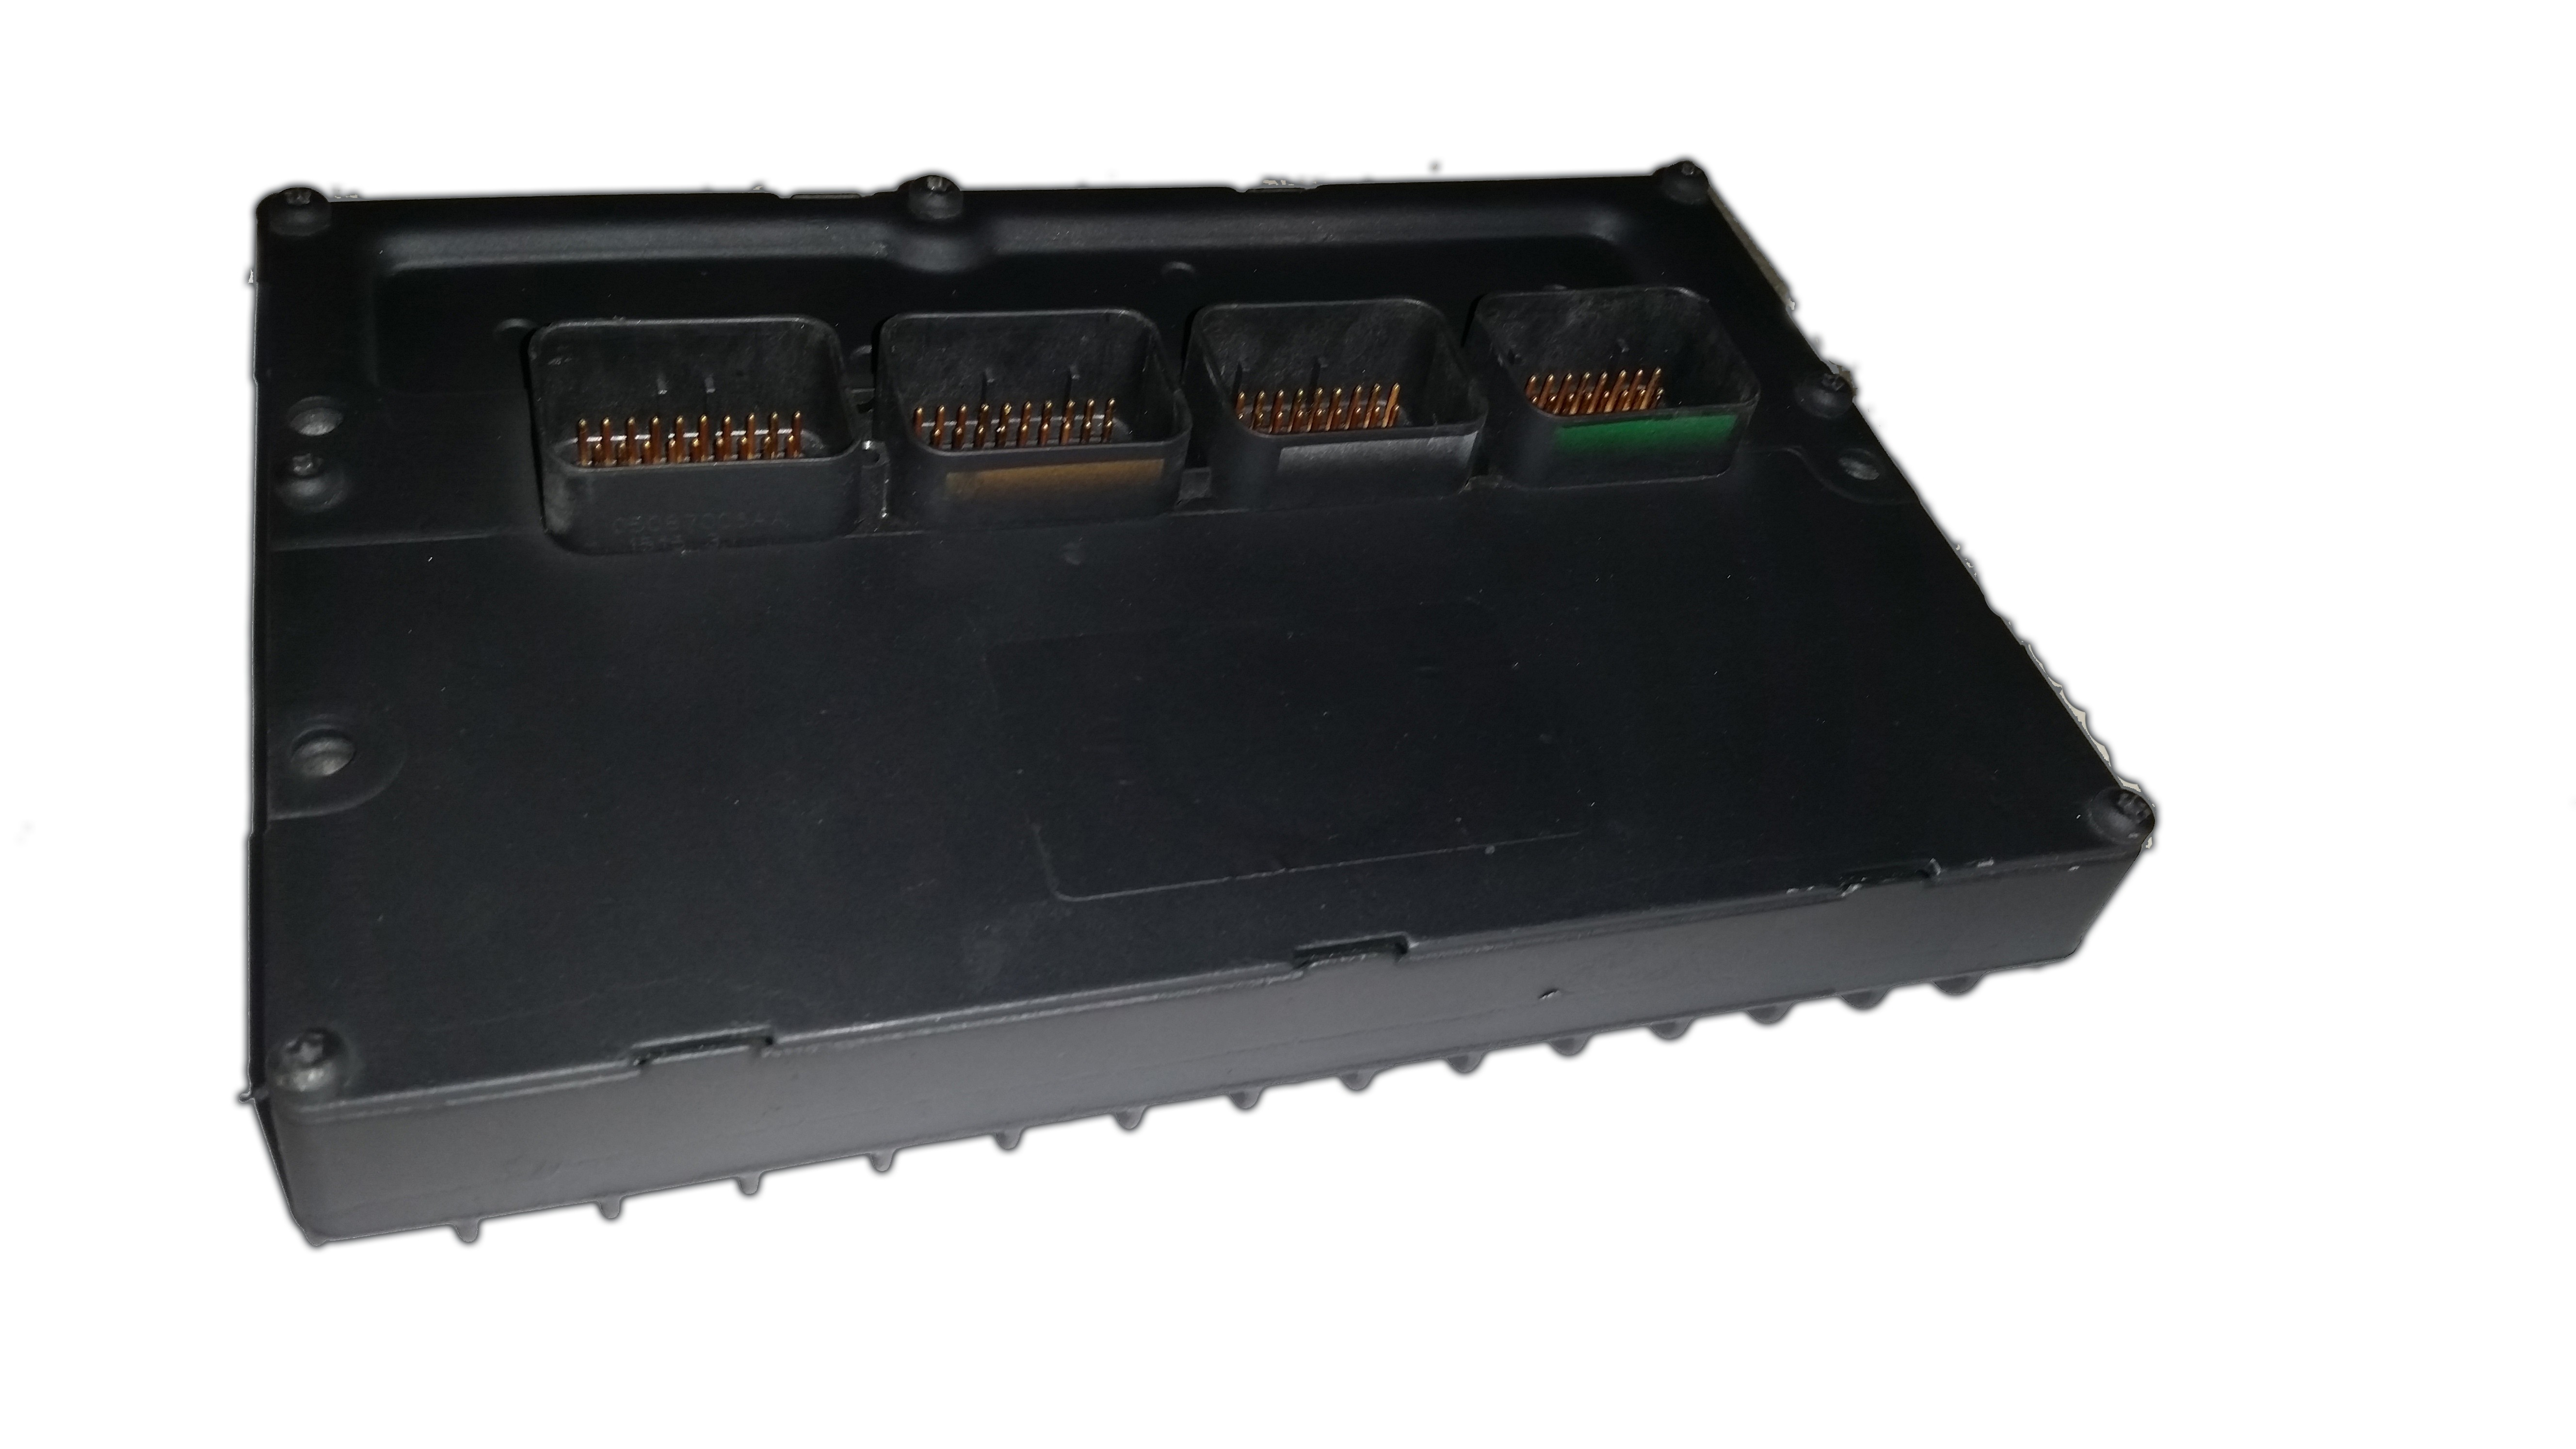 2003 Dodge Ram Truck 5.7L V8 Gas PCM / ECU / ECM Engine Computer